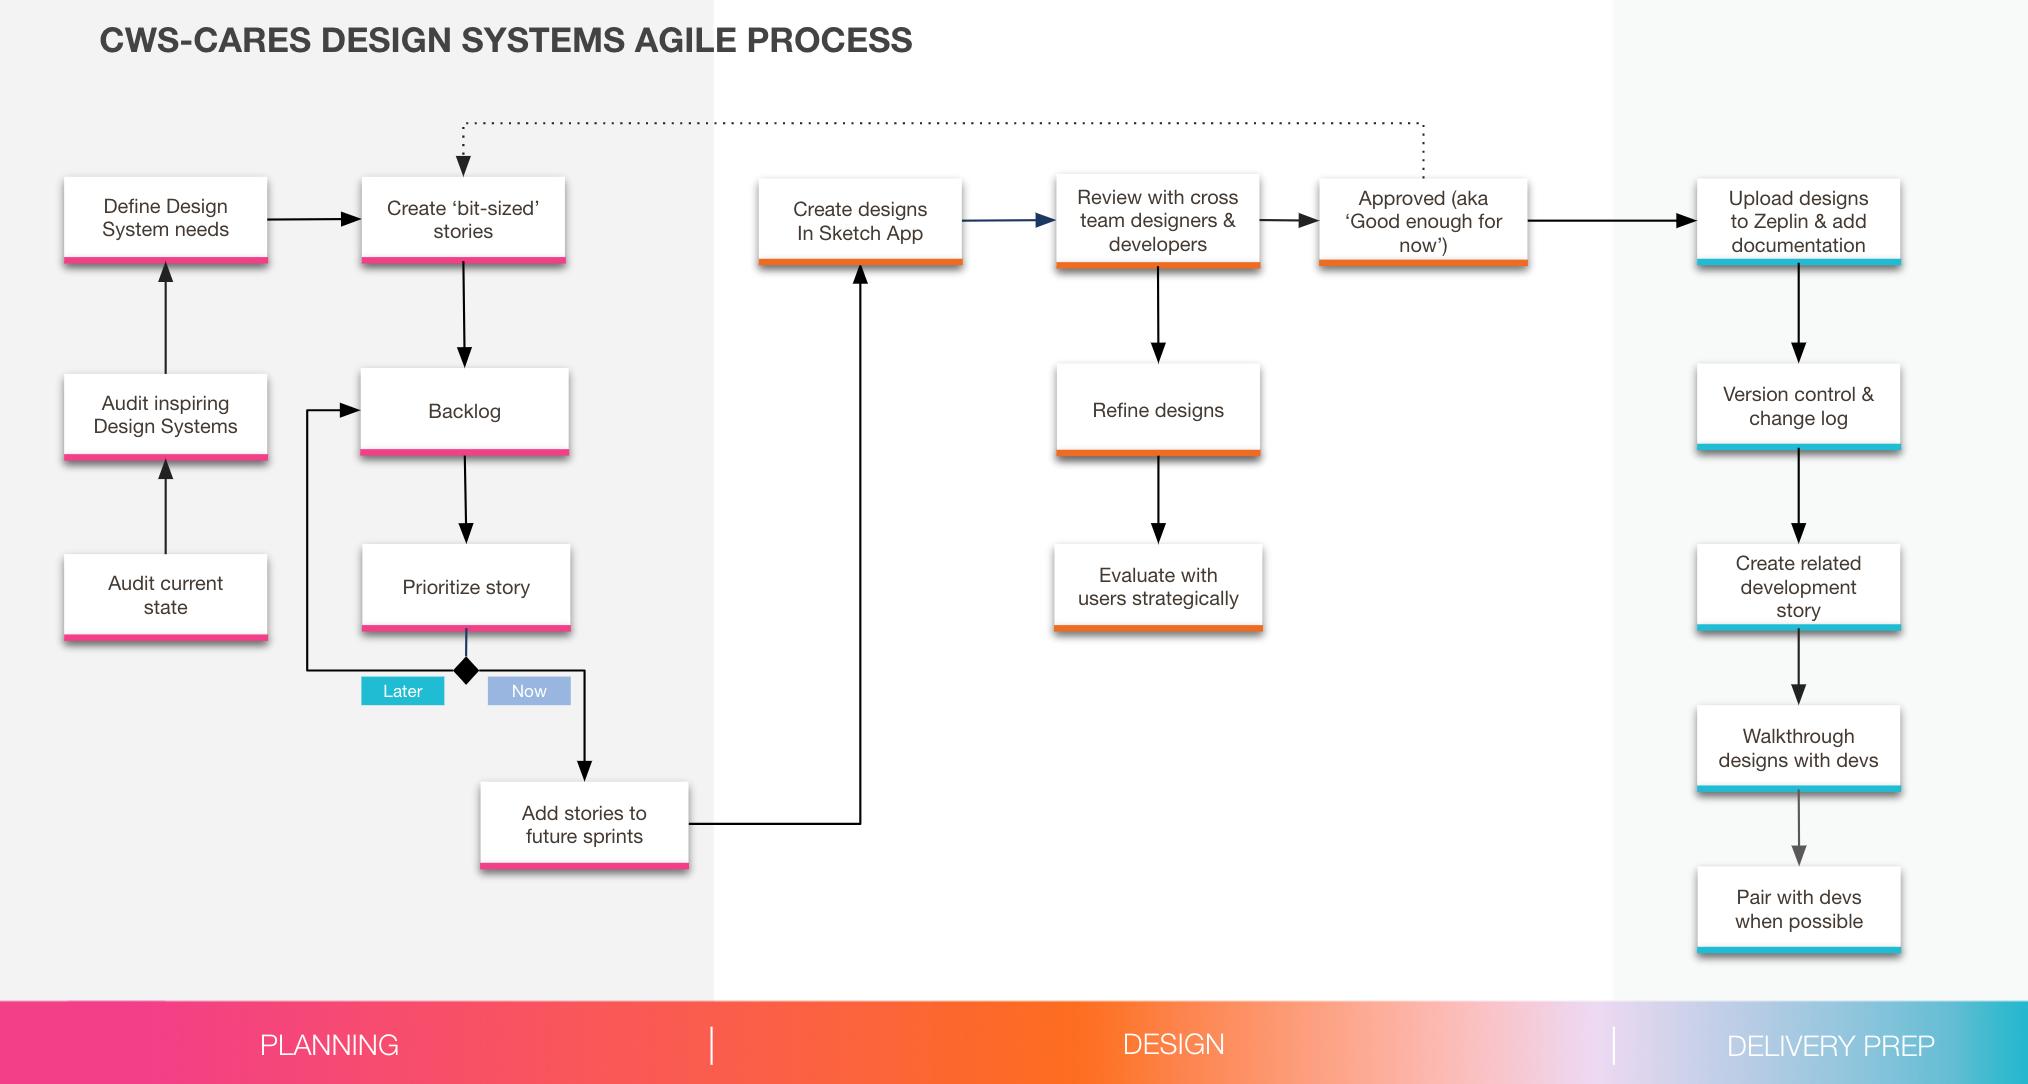 CWS-CARES Design System Agile Process